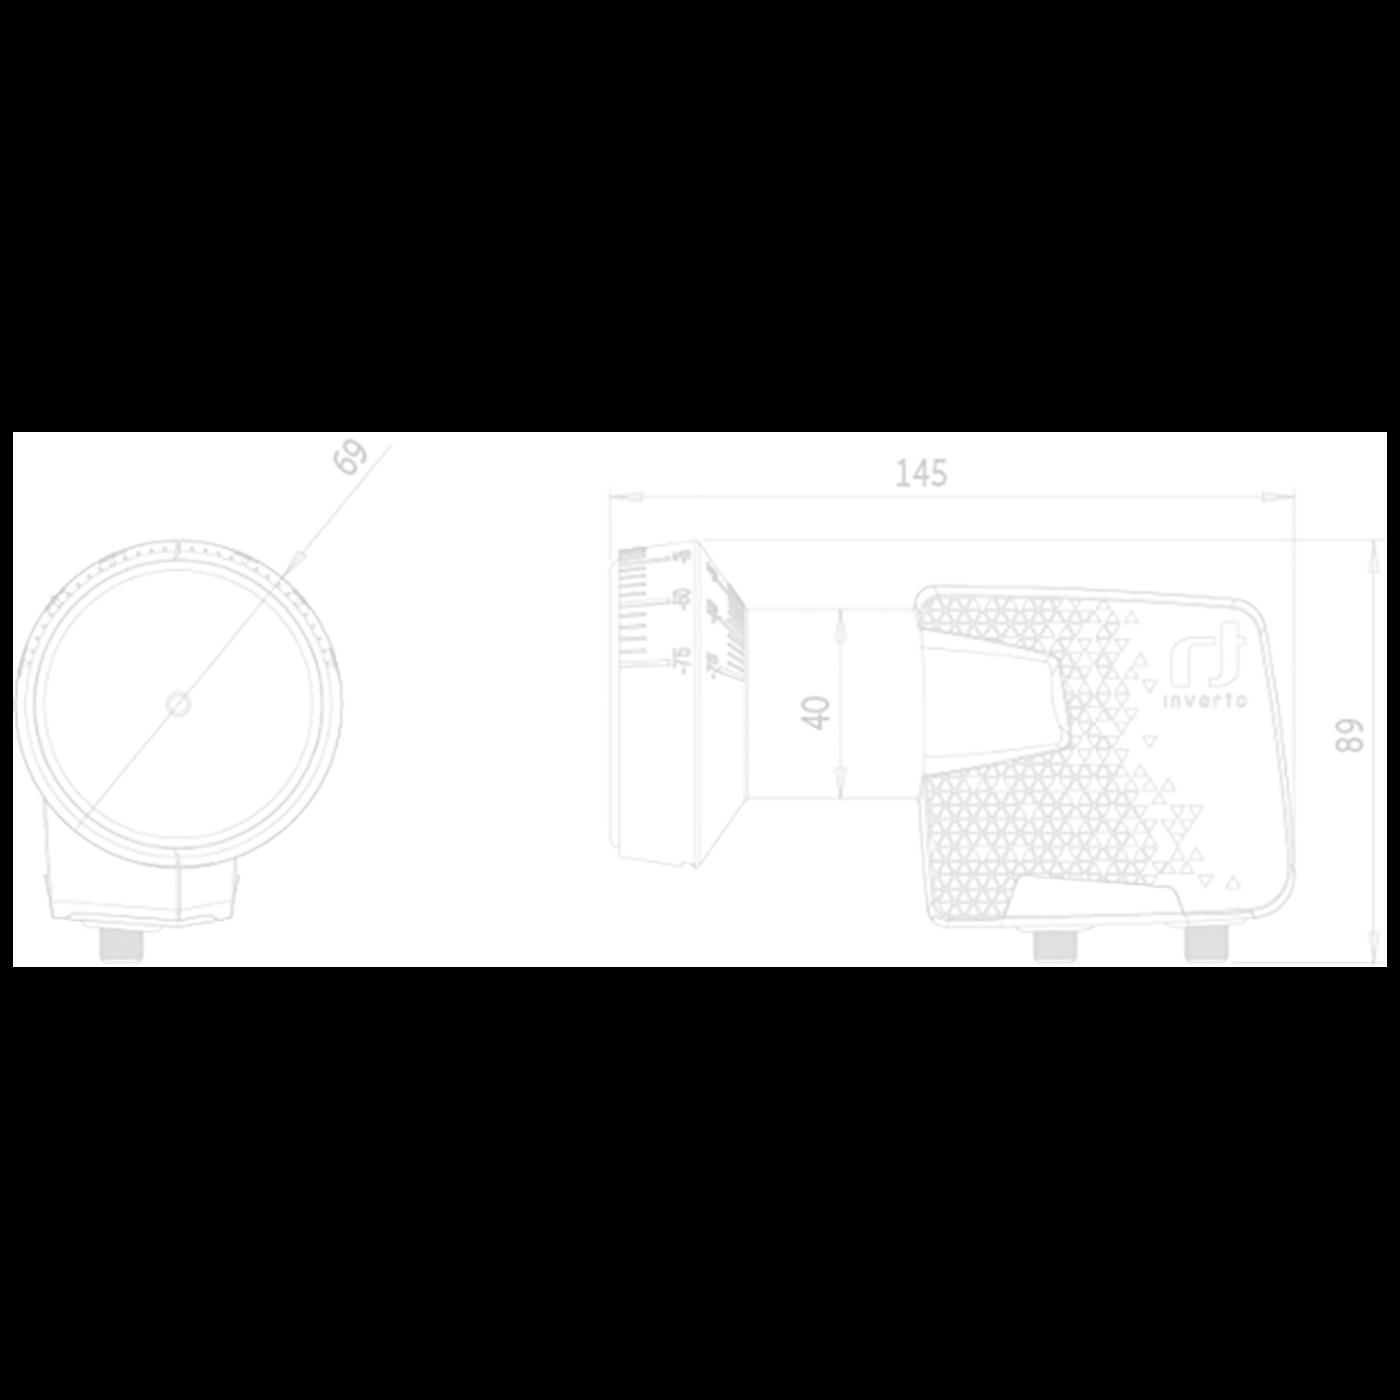 IDLP-TWL410-PREMU-OPN